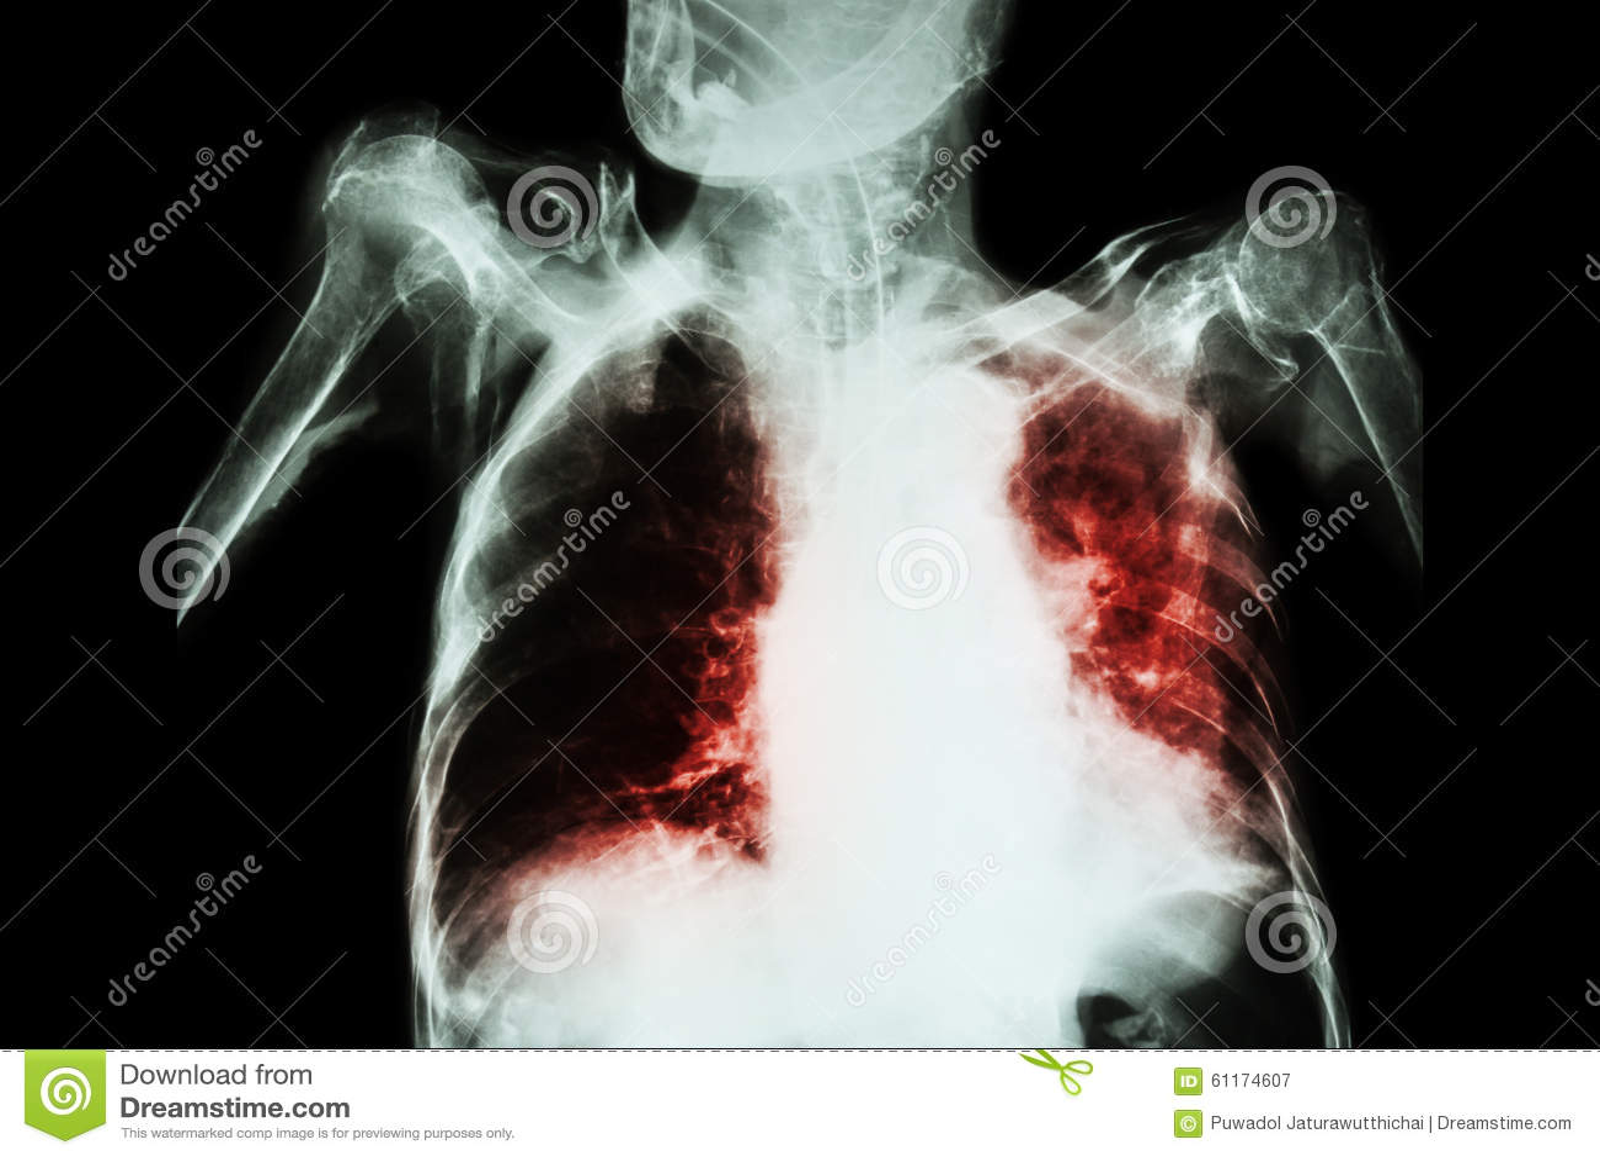 Pulmonary Tuberculosis ( TB ) : Chest X-ray Show Alveolar ...